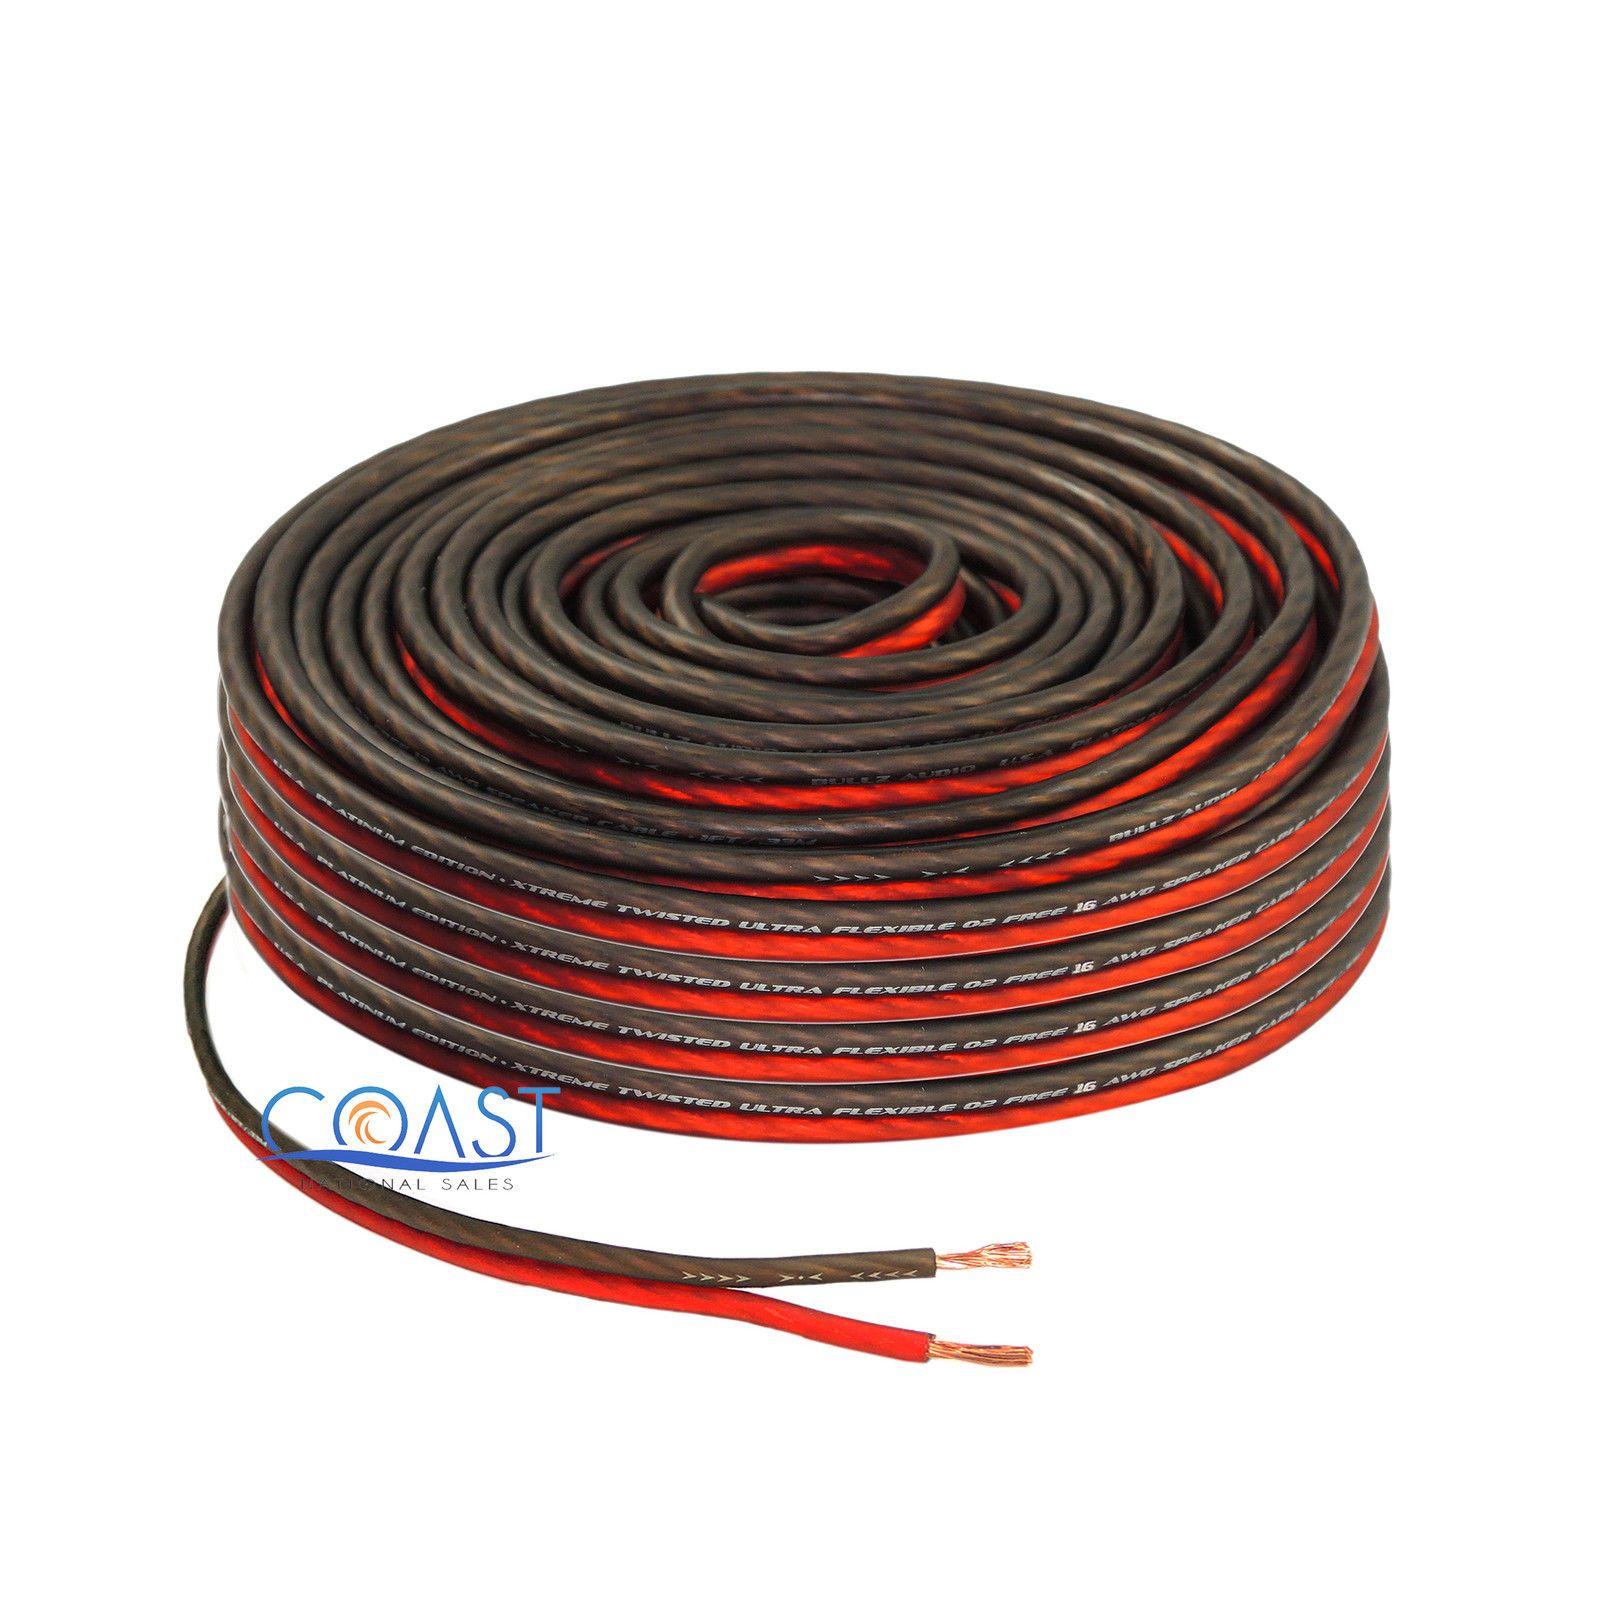 red 100 ft true 16 gauge awg car home audio speaker wire cable rh pinterest com Car Stereo Speaker Wiring Diagram Pioneer Car Stereo Wiring Diagram